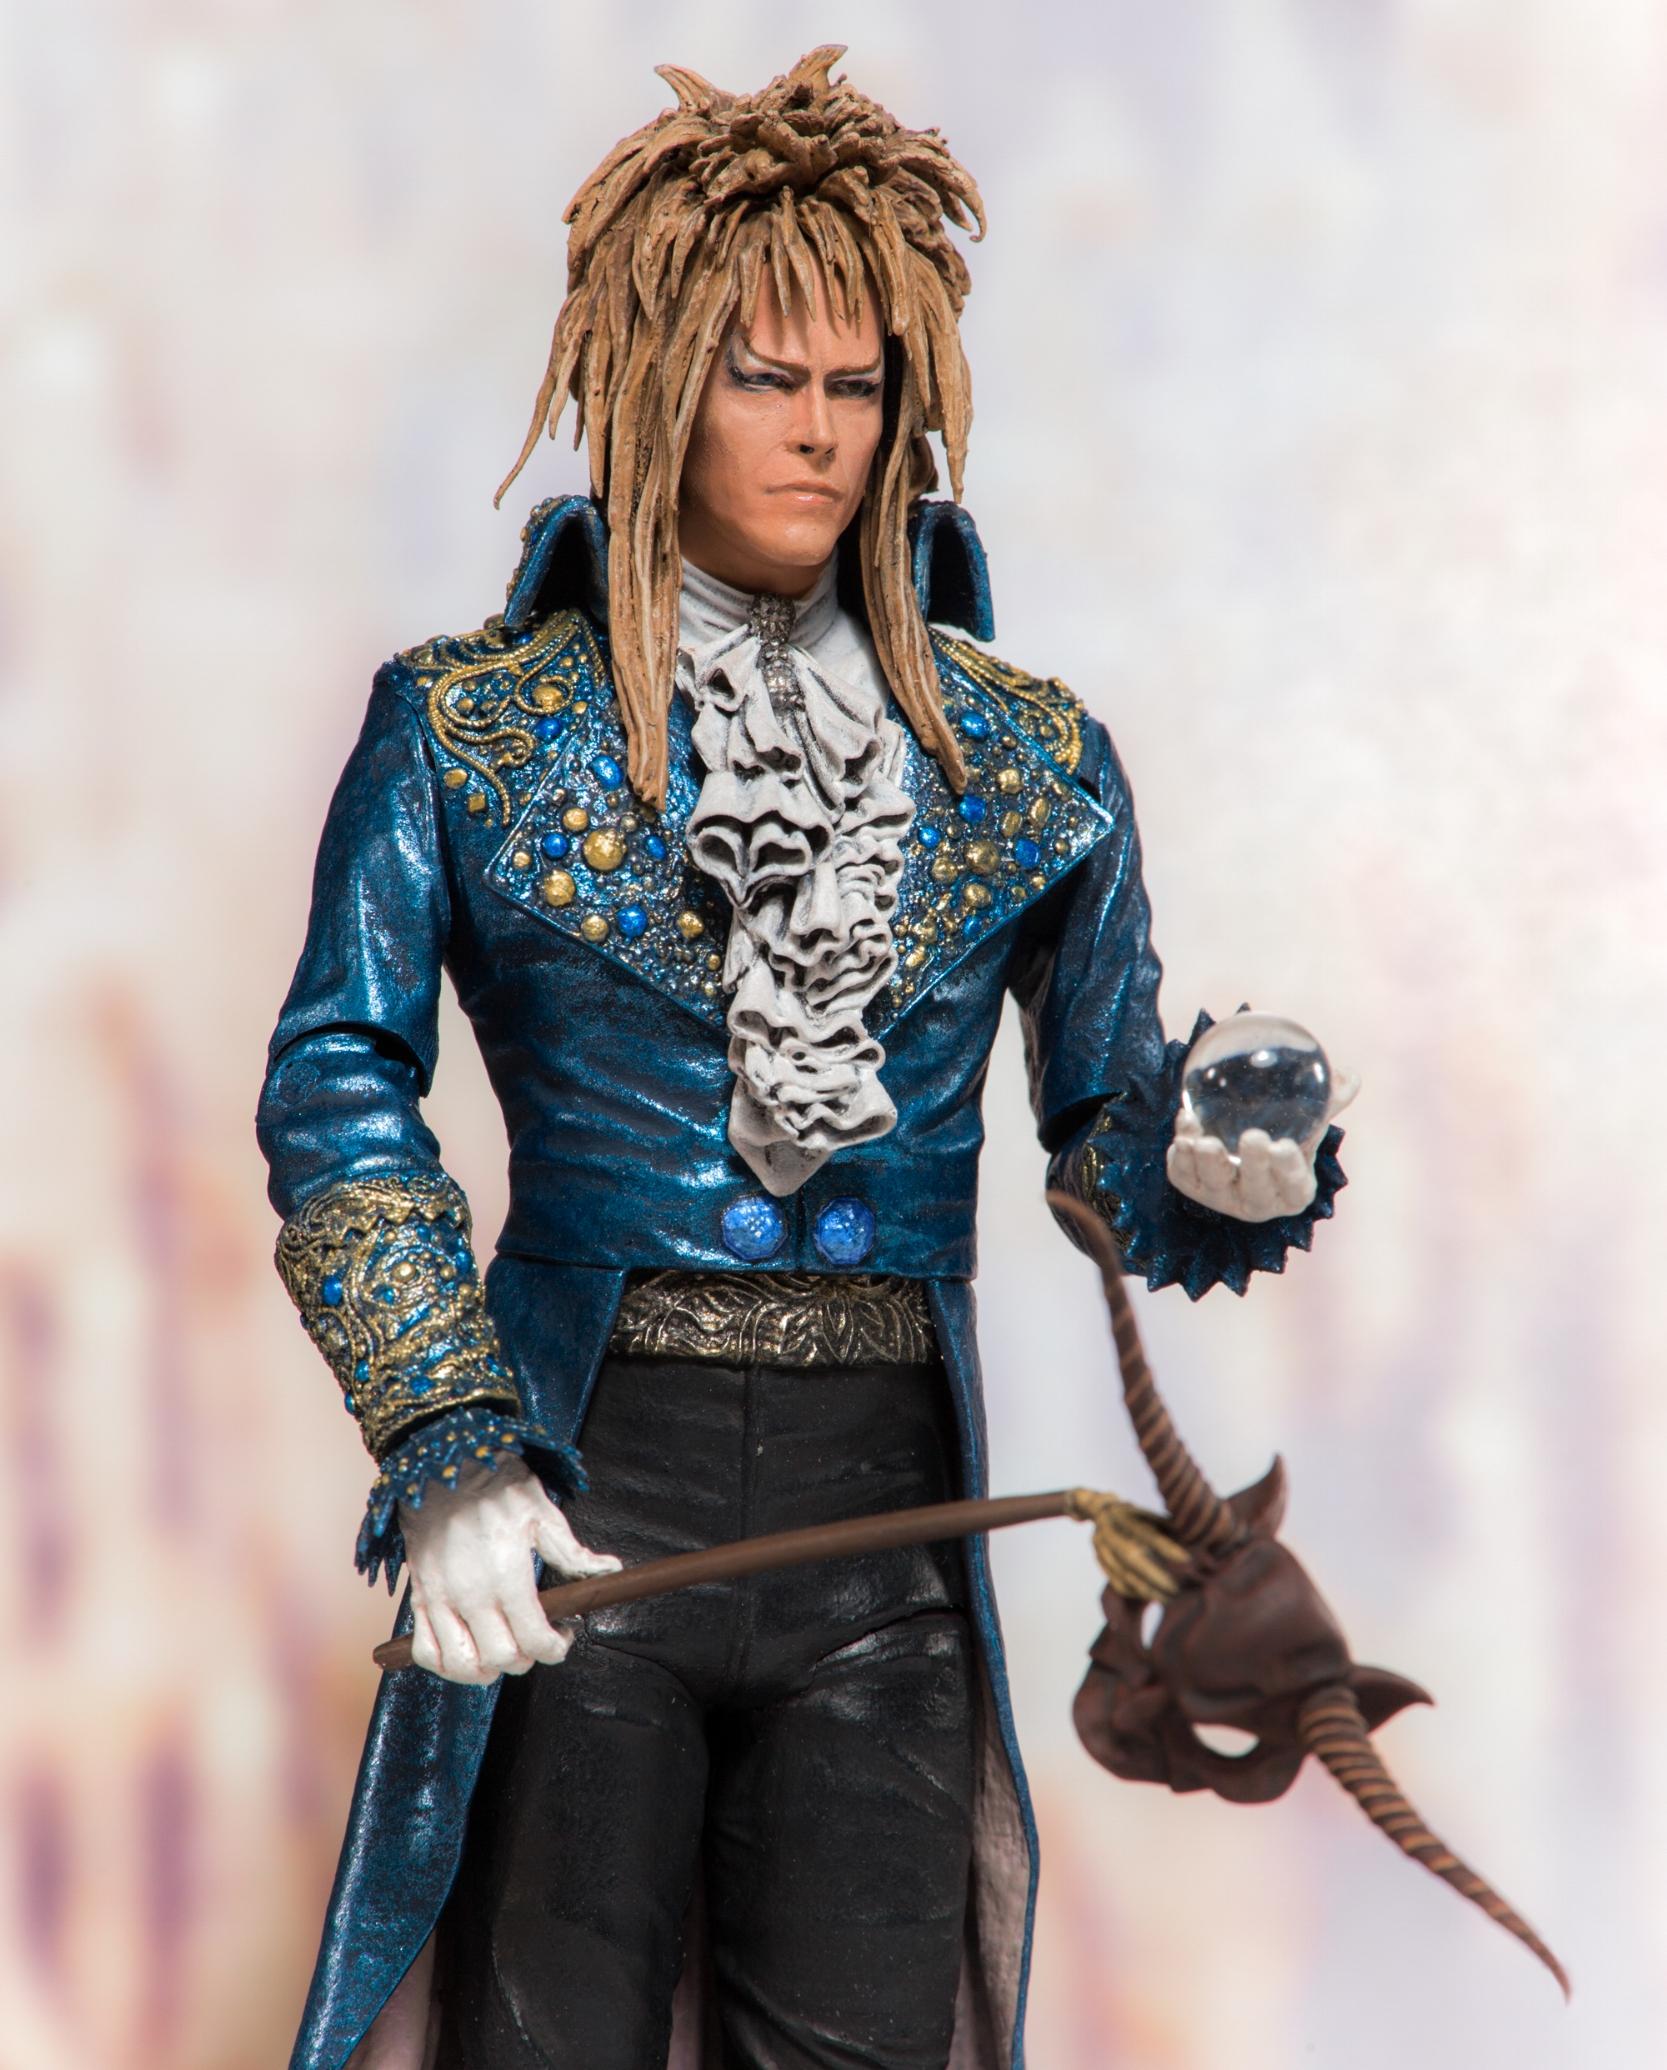 Jareth the Goblin King Action Figure